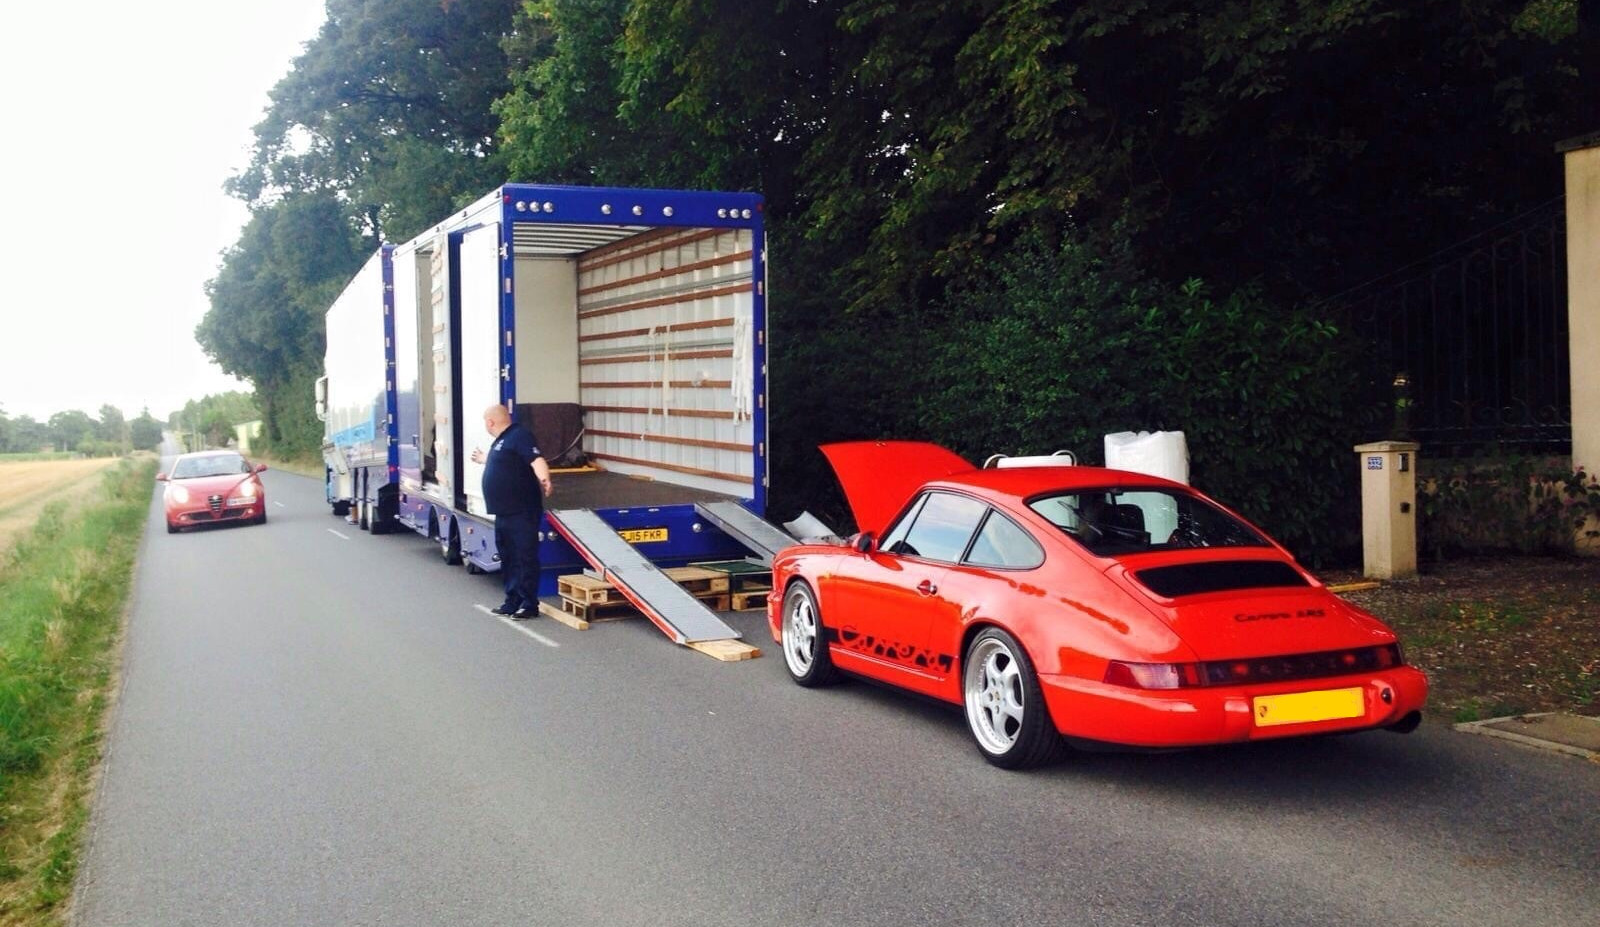 Porsche Richard Healey vehicle relocation unload